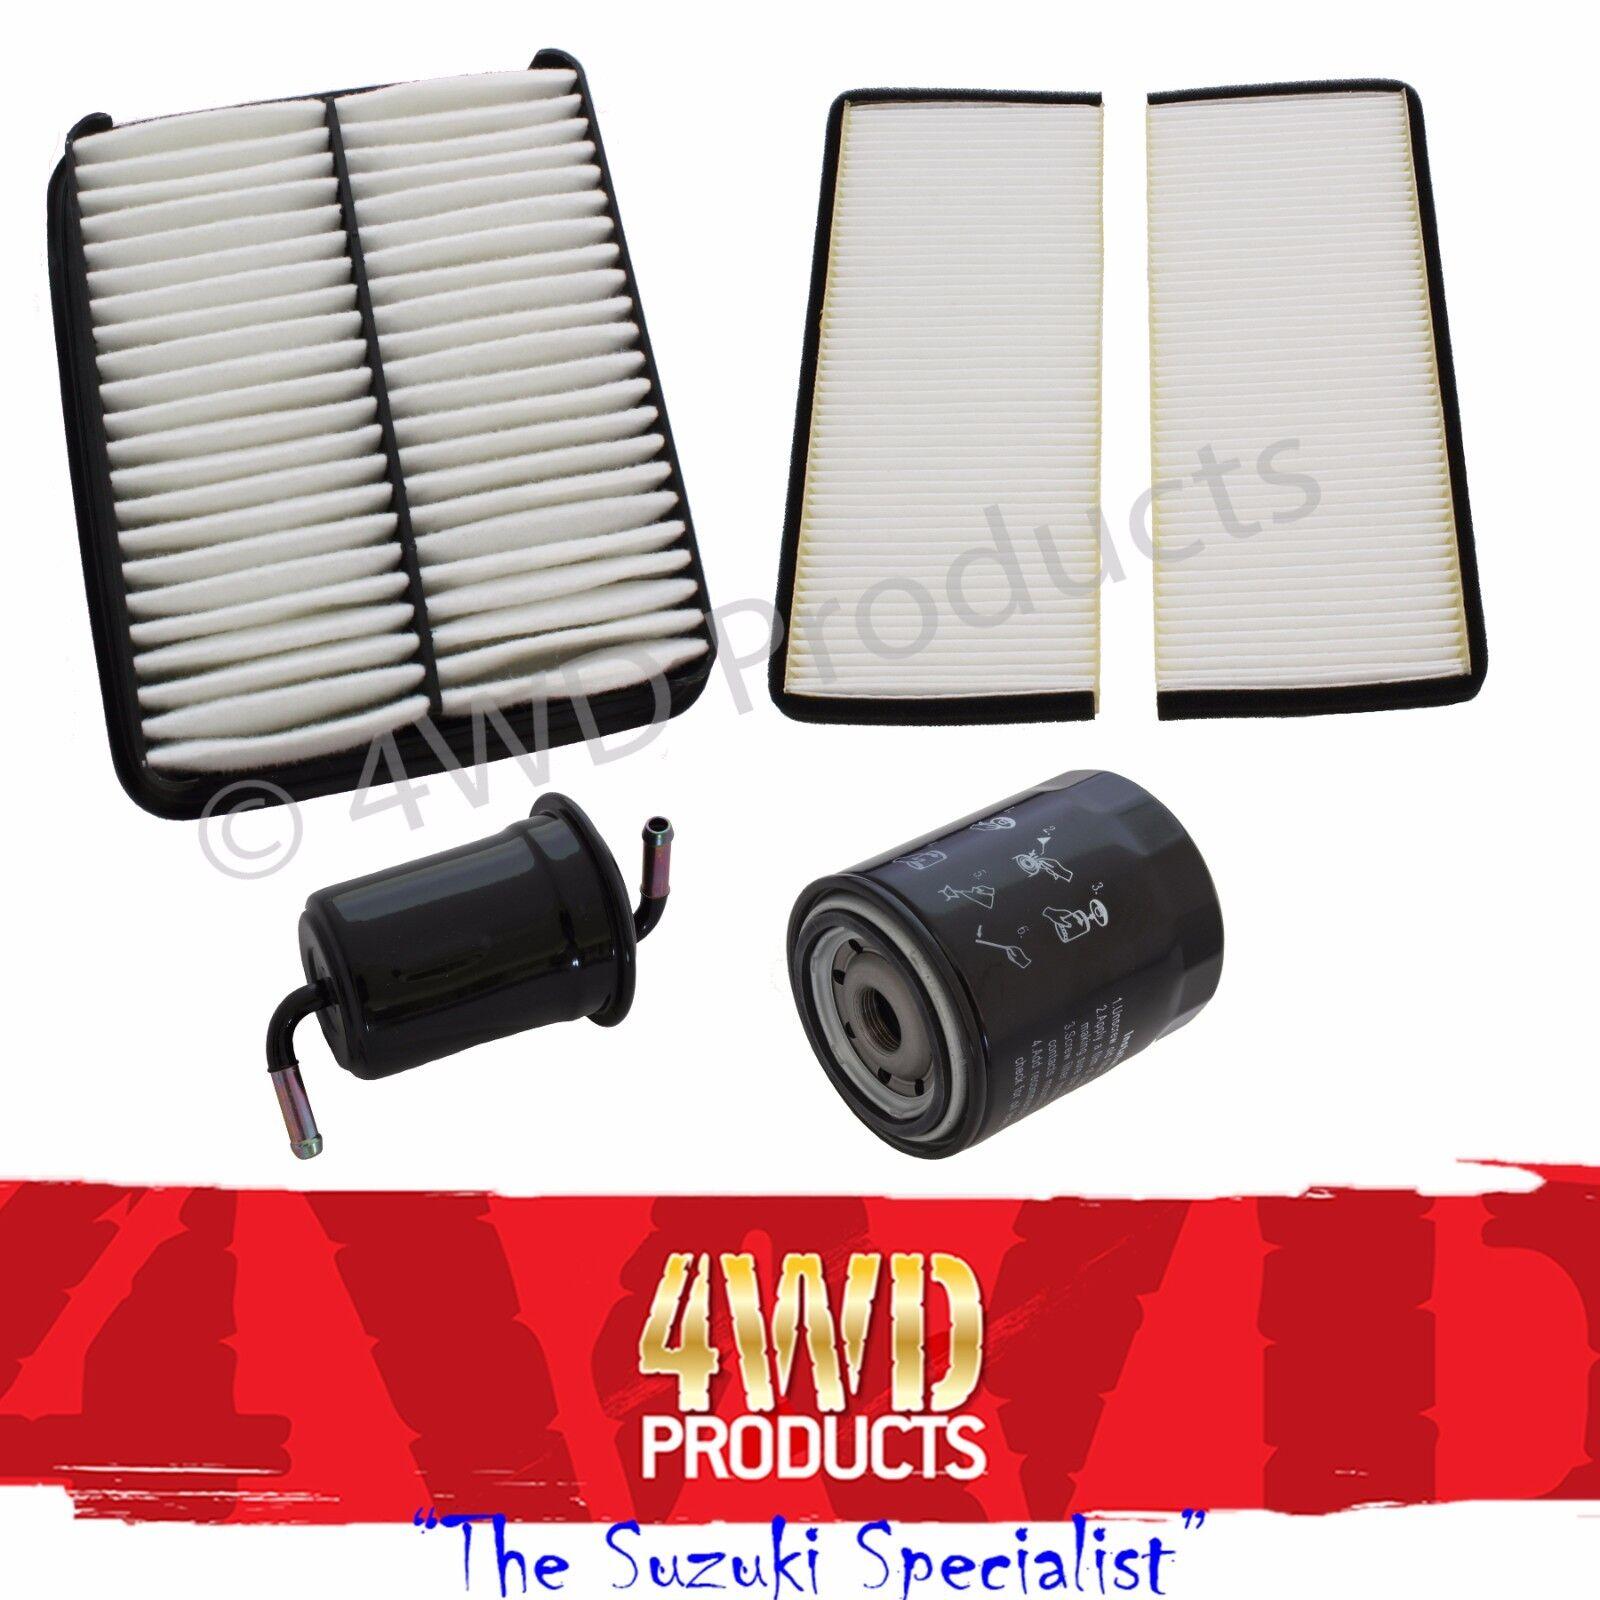 Oil-Air-Fuel-Cabin Filter + Spark Plug kit - Suzuki XL7 2.7-V6 H27A  (01-8/03)